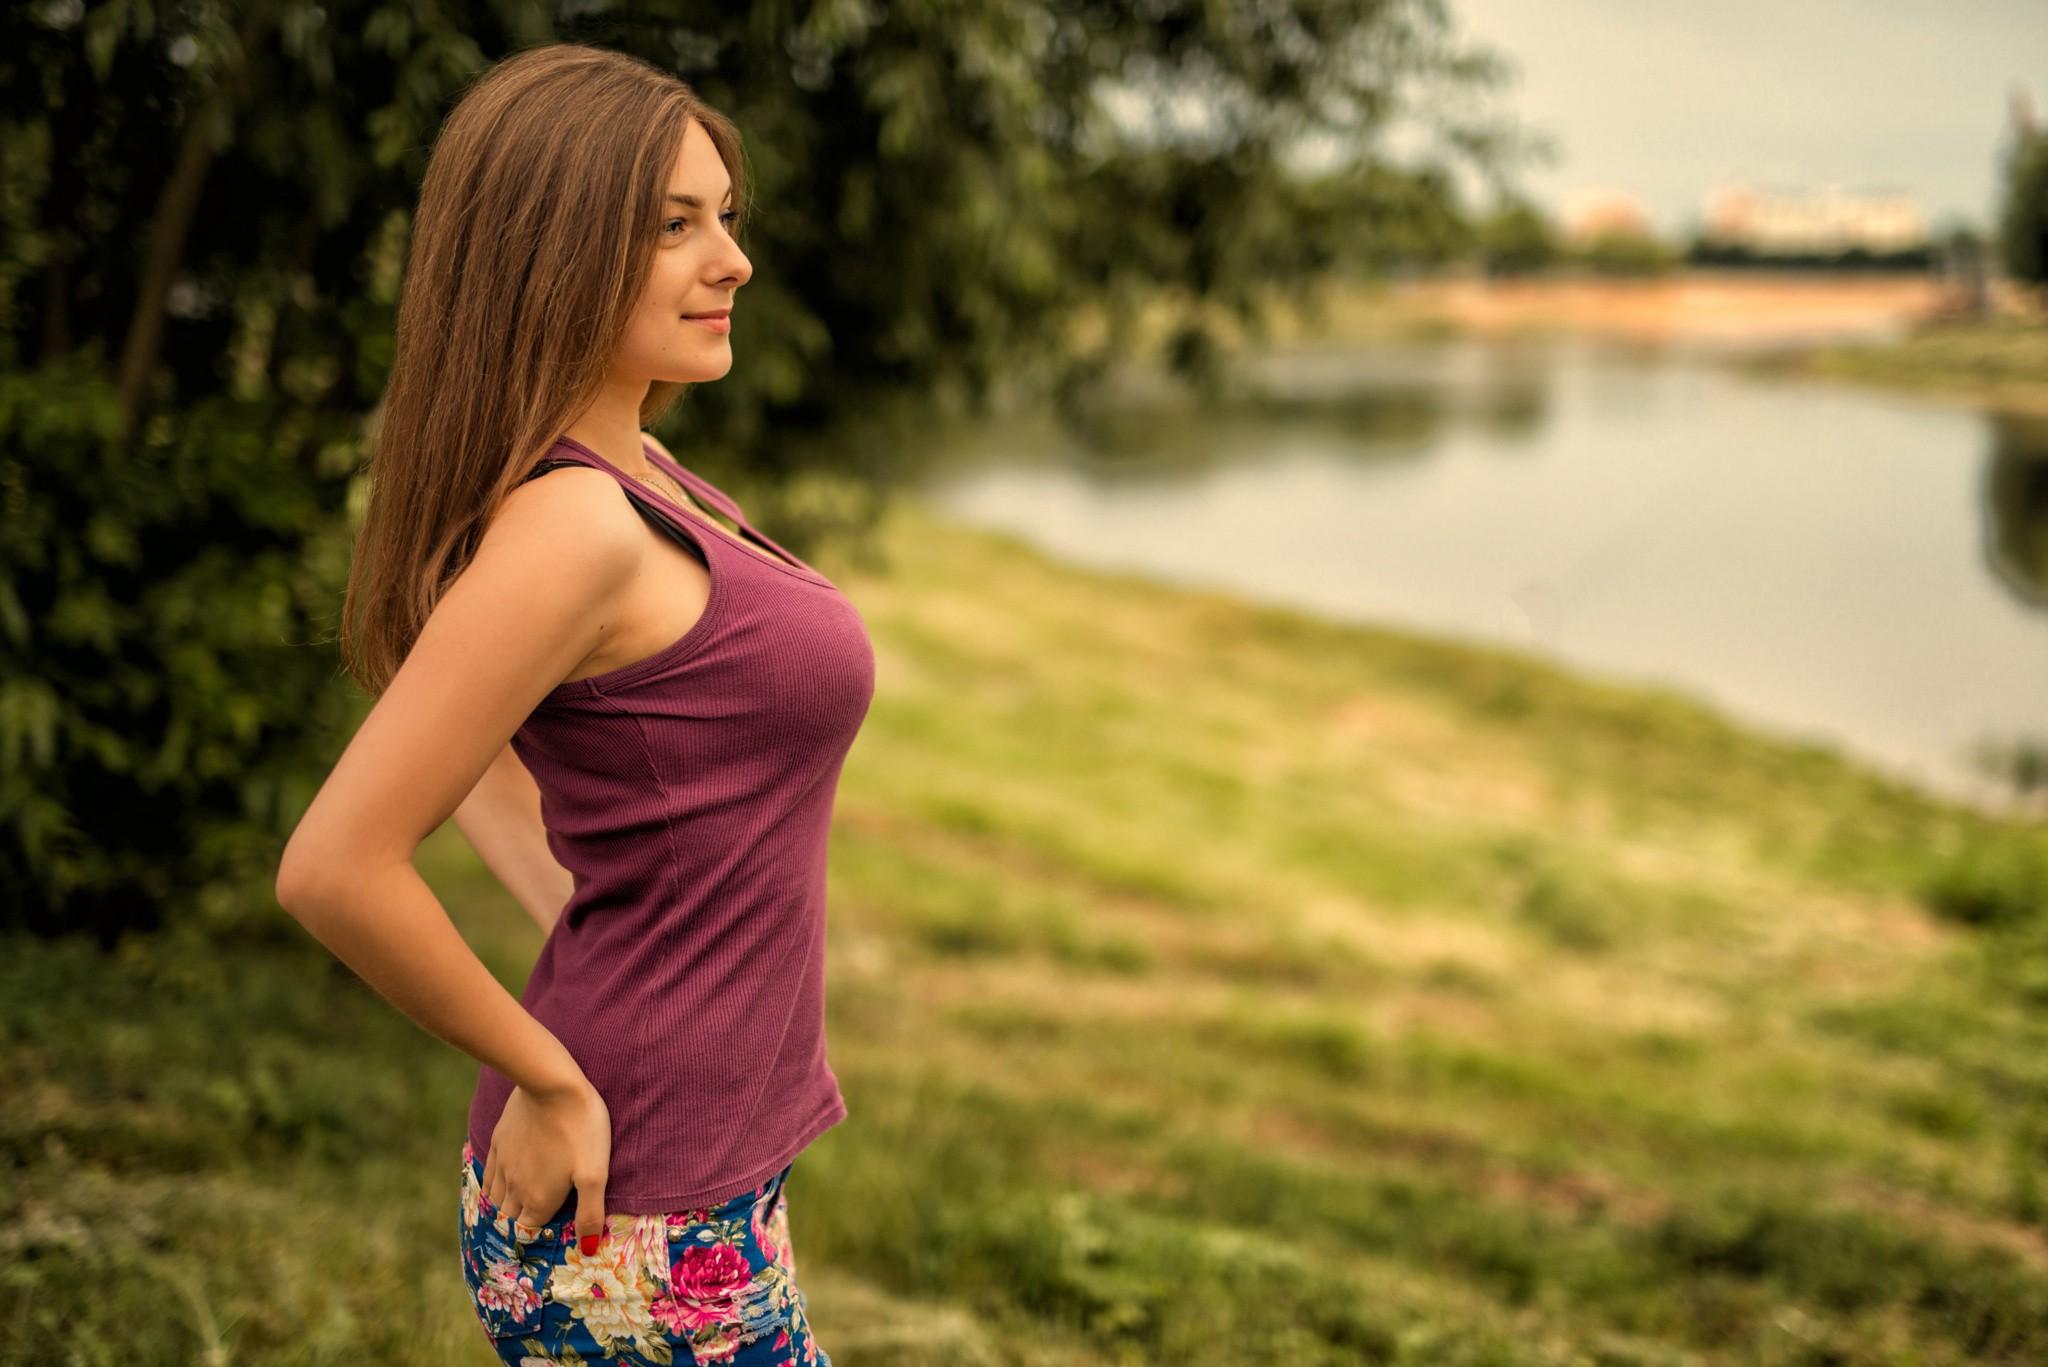 Pictures Of Daria Honcikova